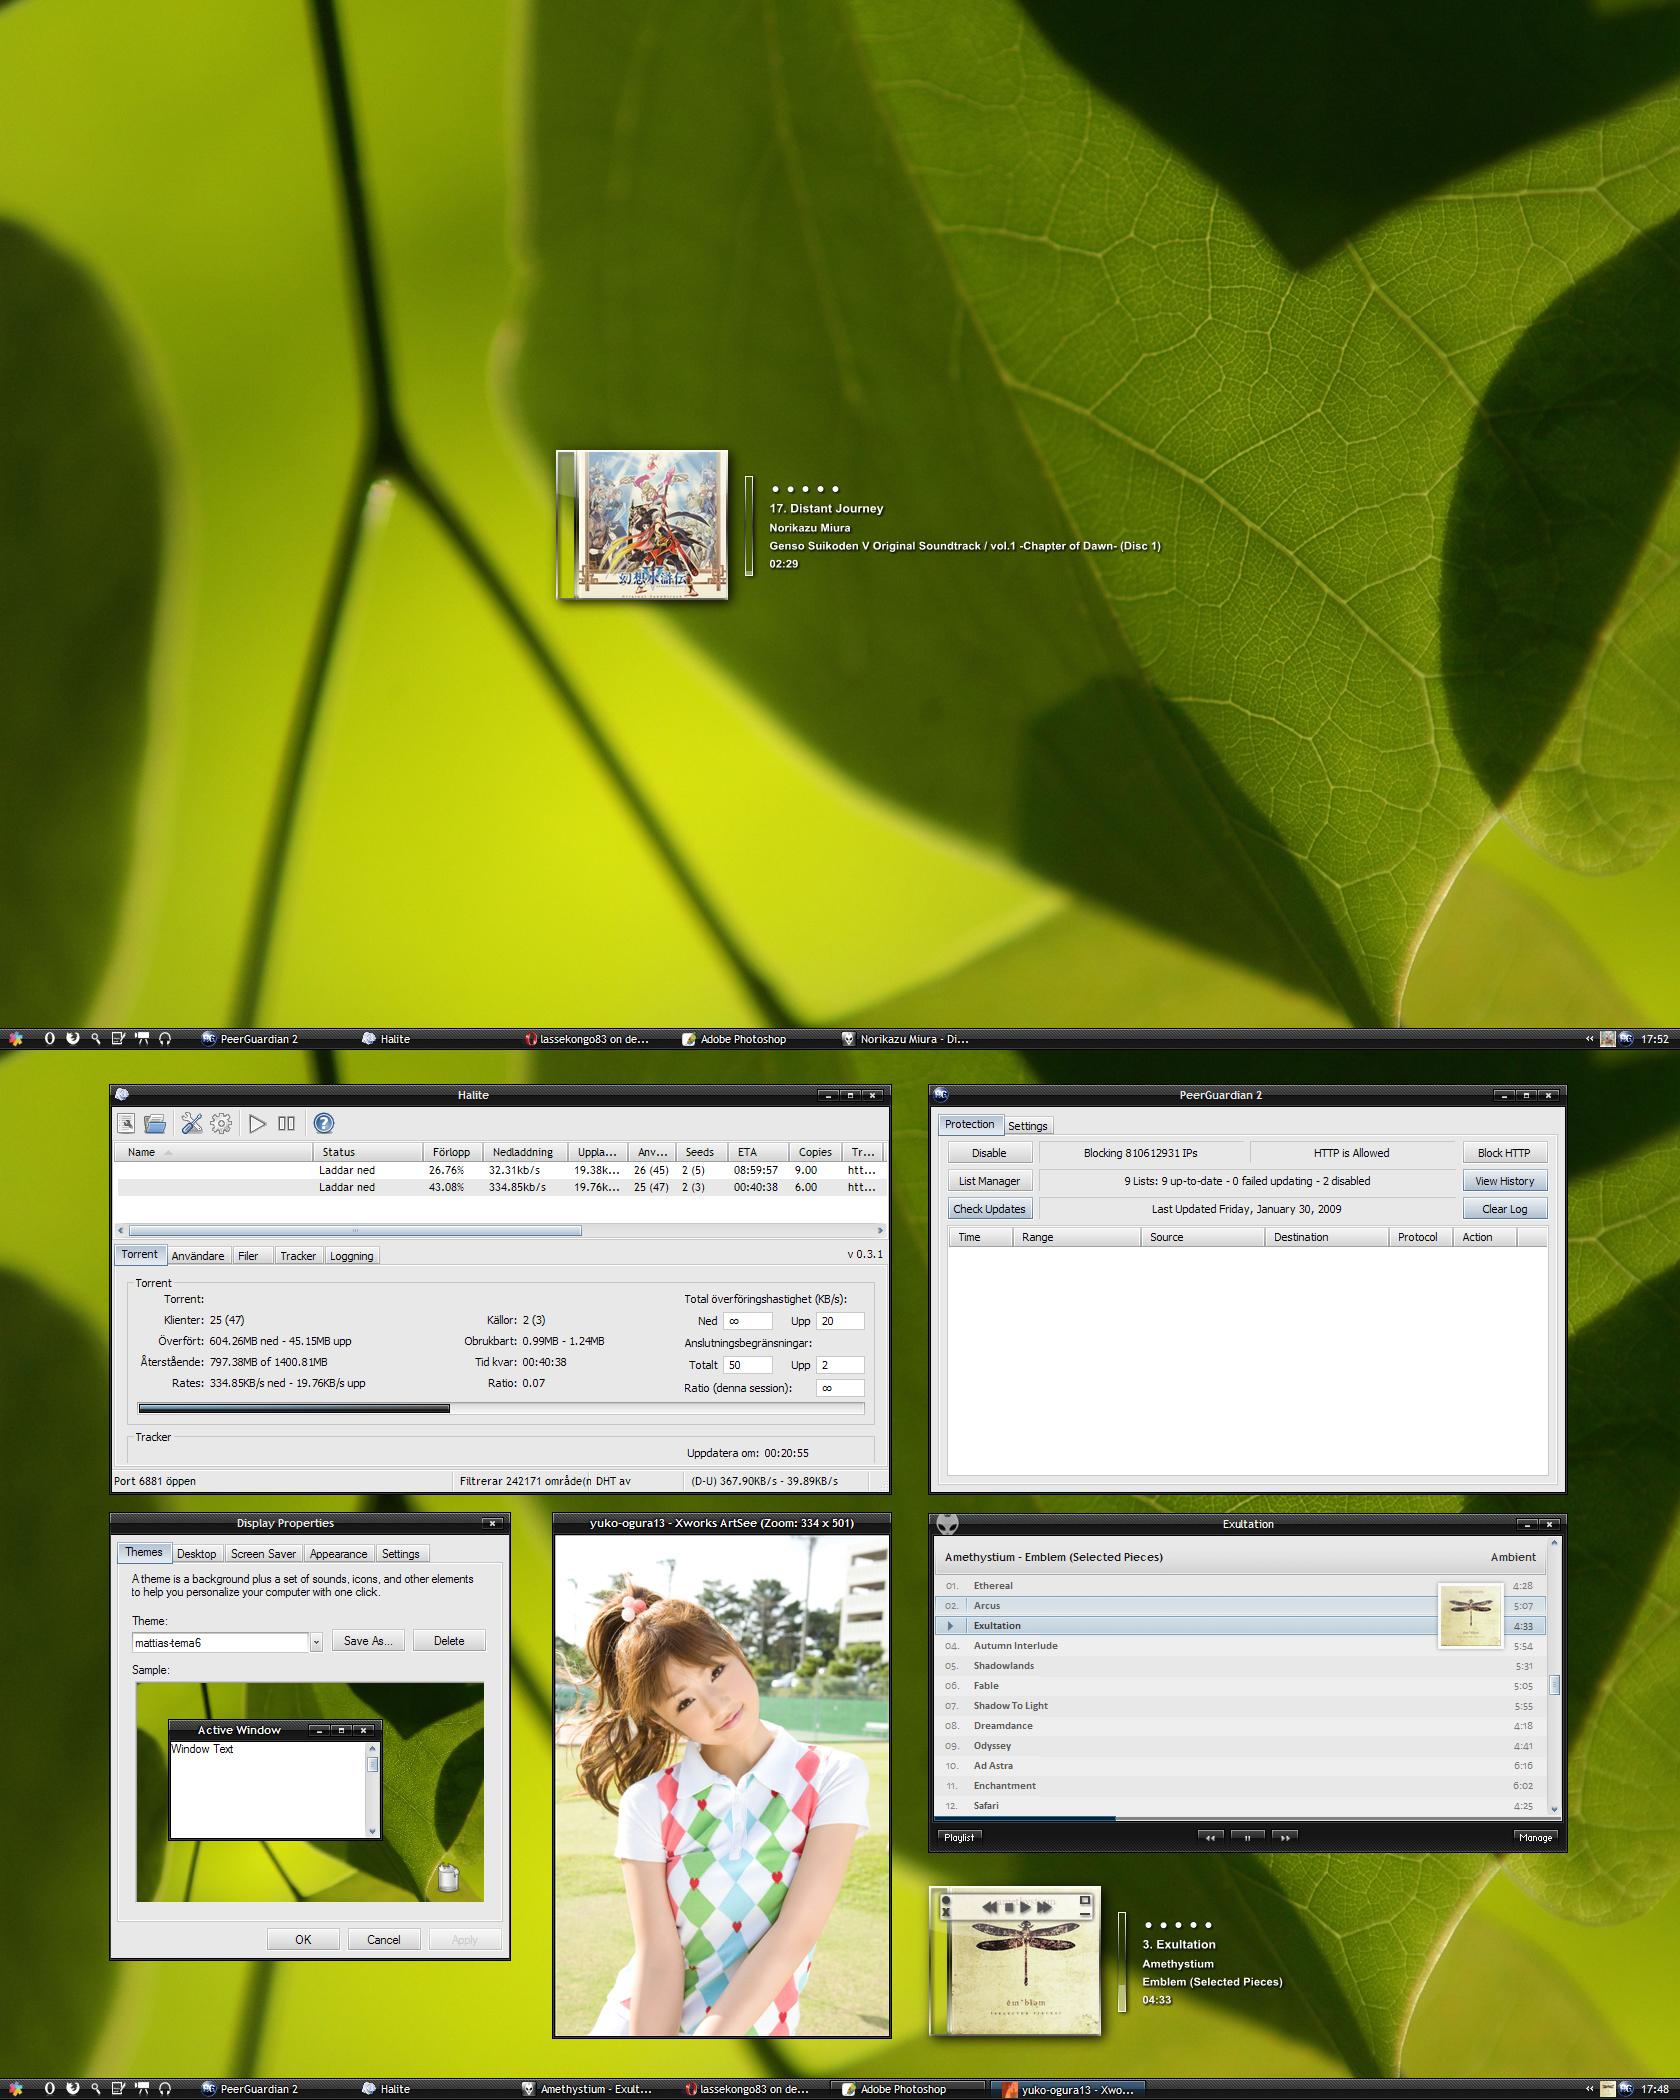 Desktop 2009-01-31 by lassekongo83